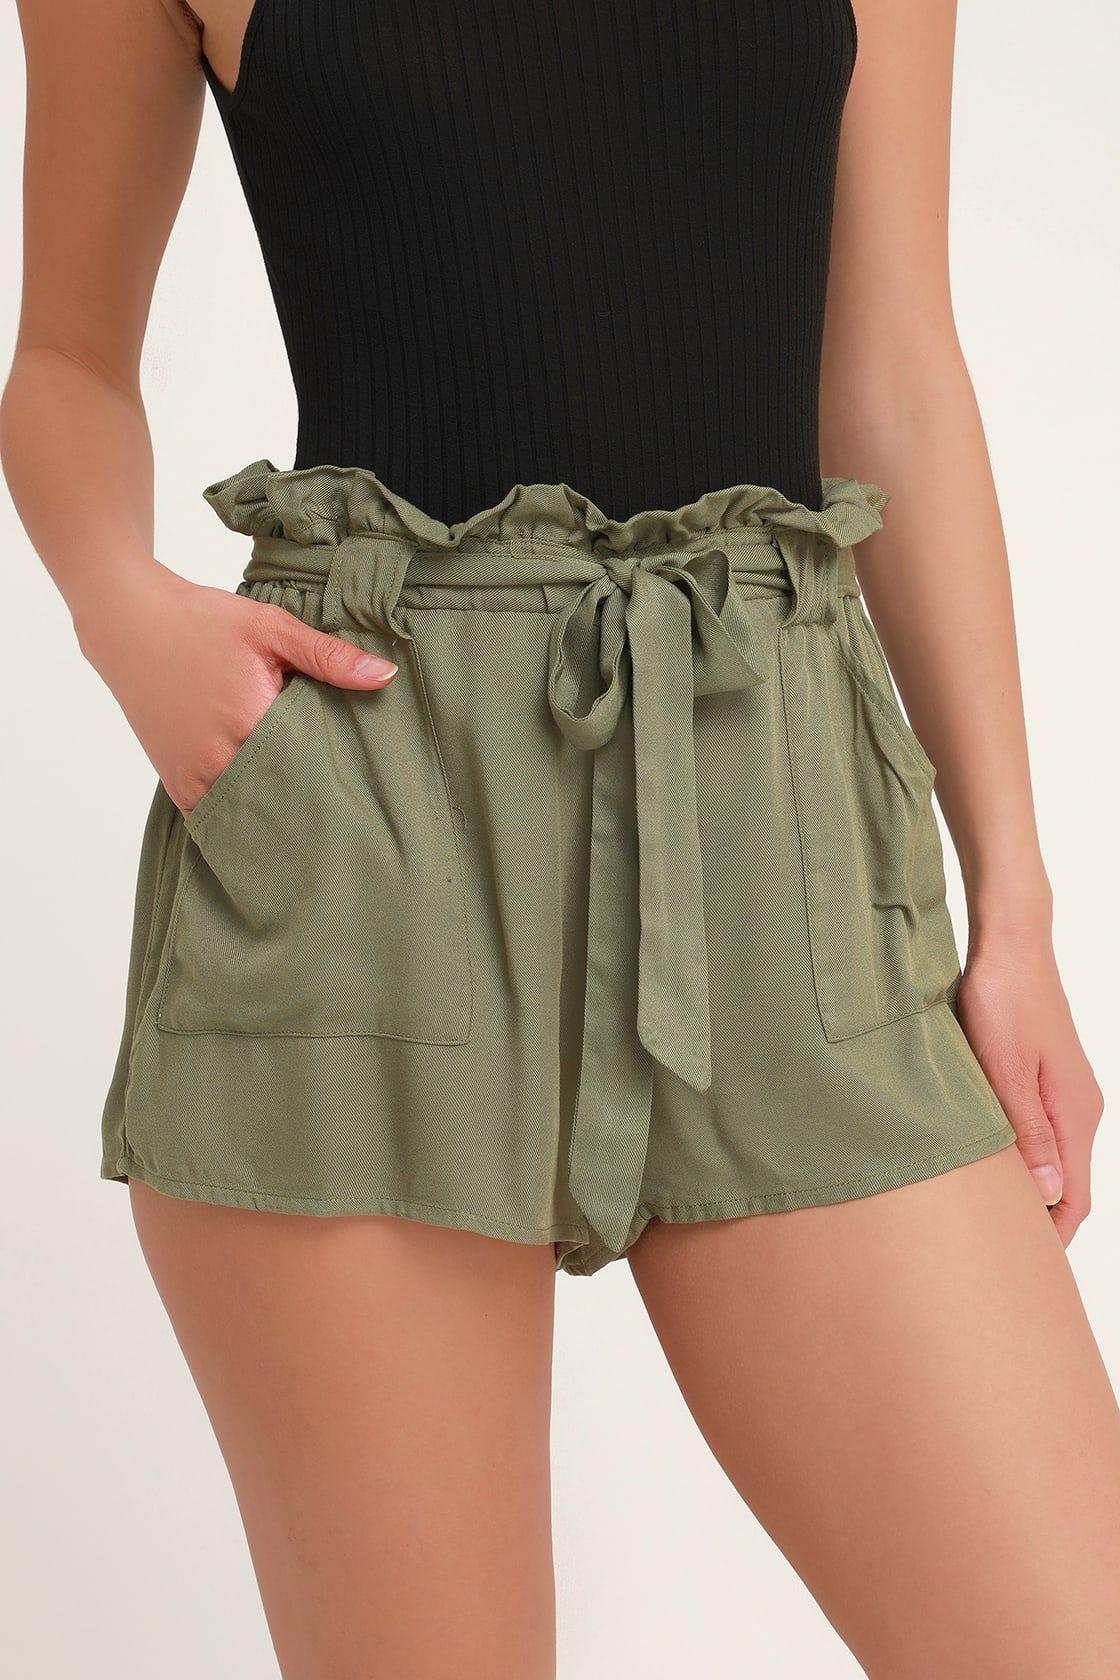 Belt It Out Olive Green Paper Bag Waist Shorts Green Shorts Outfit Olive Green Shorts Paper Bag Shorts